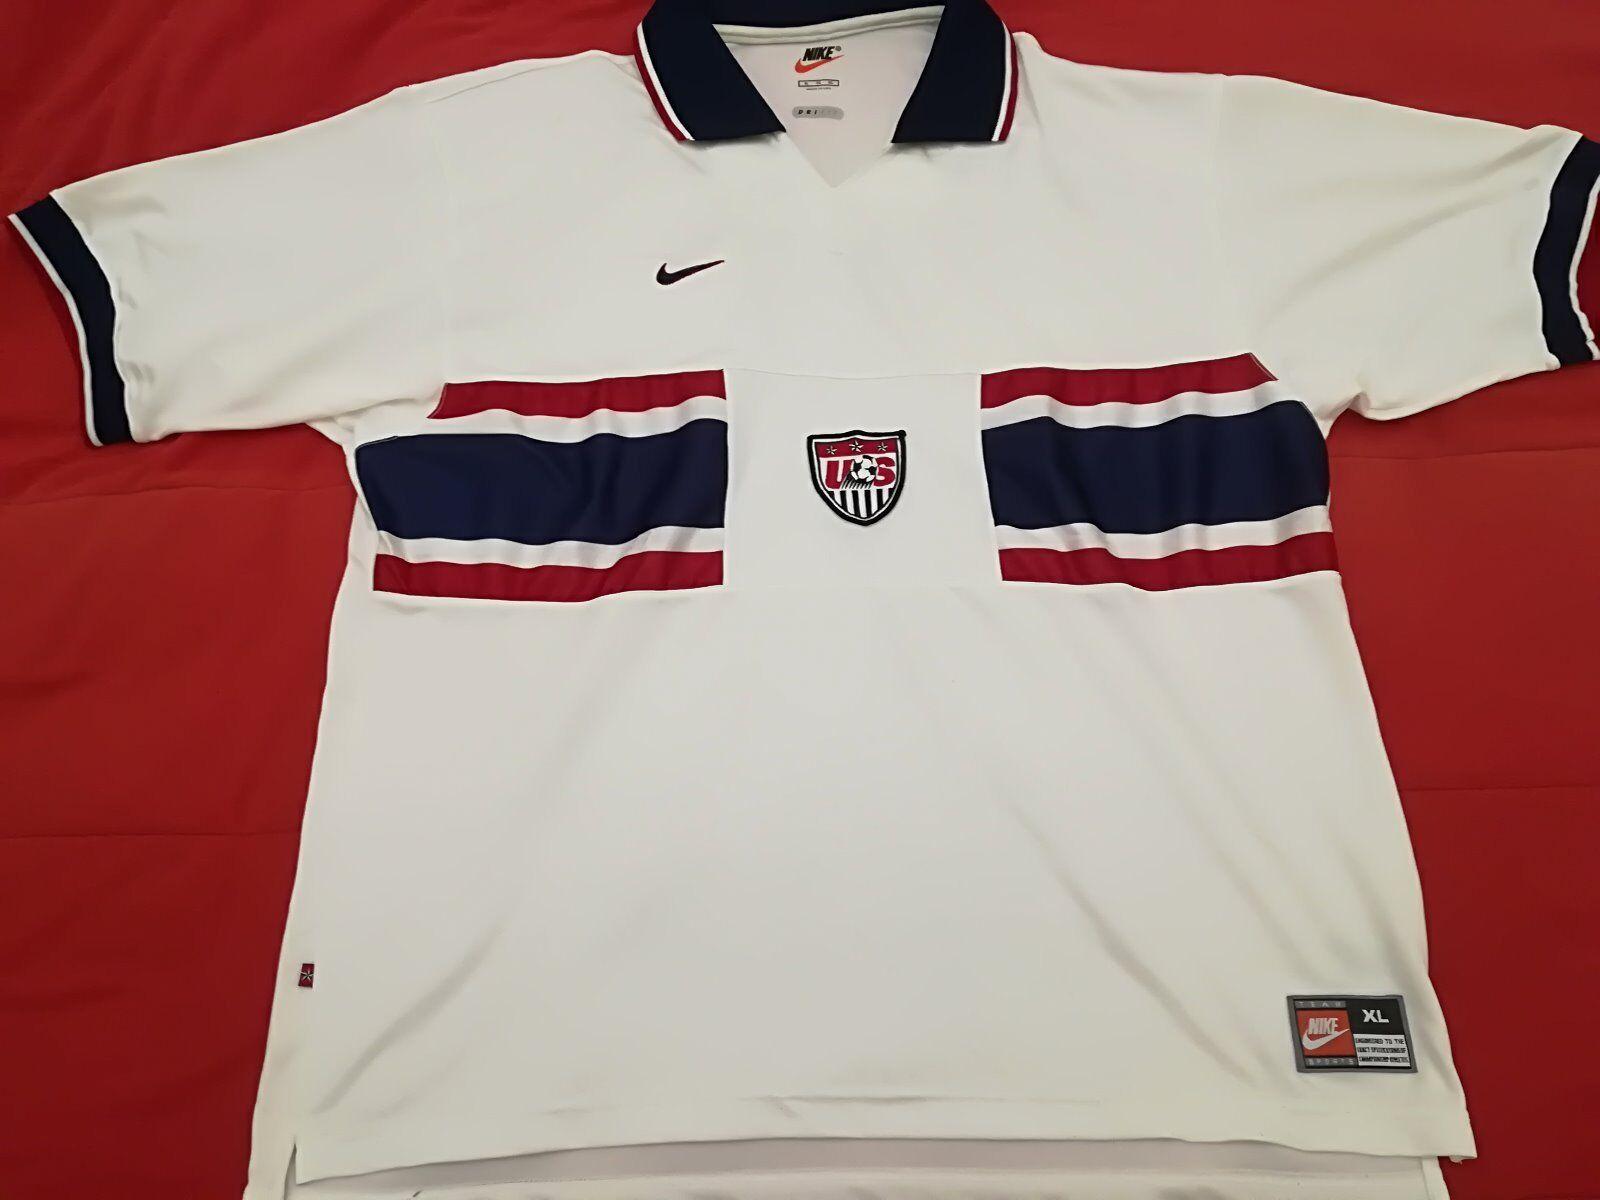 Maglia calcio Stati Uniti USA football camiseta shirts soccer Größe XL no match